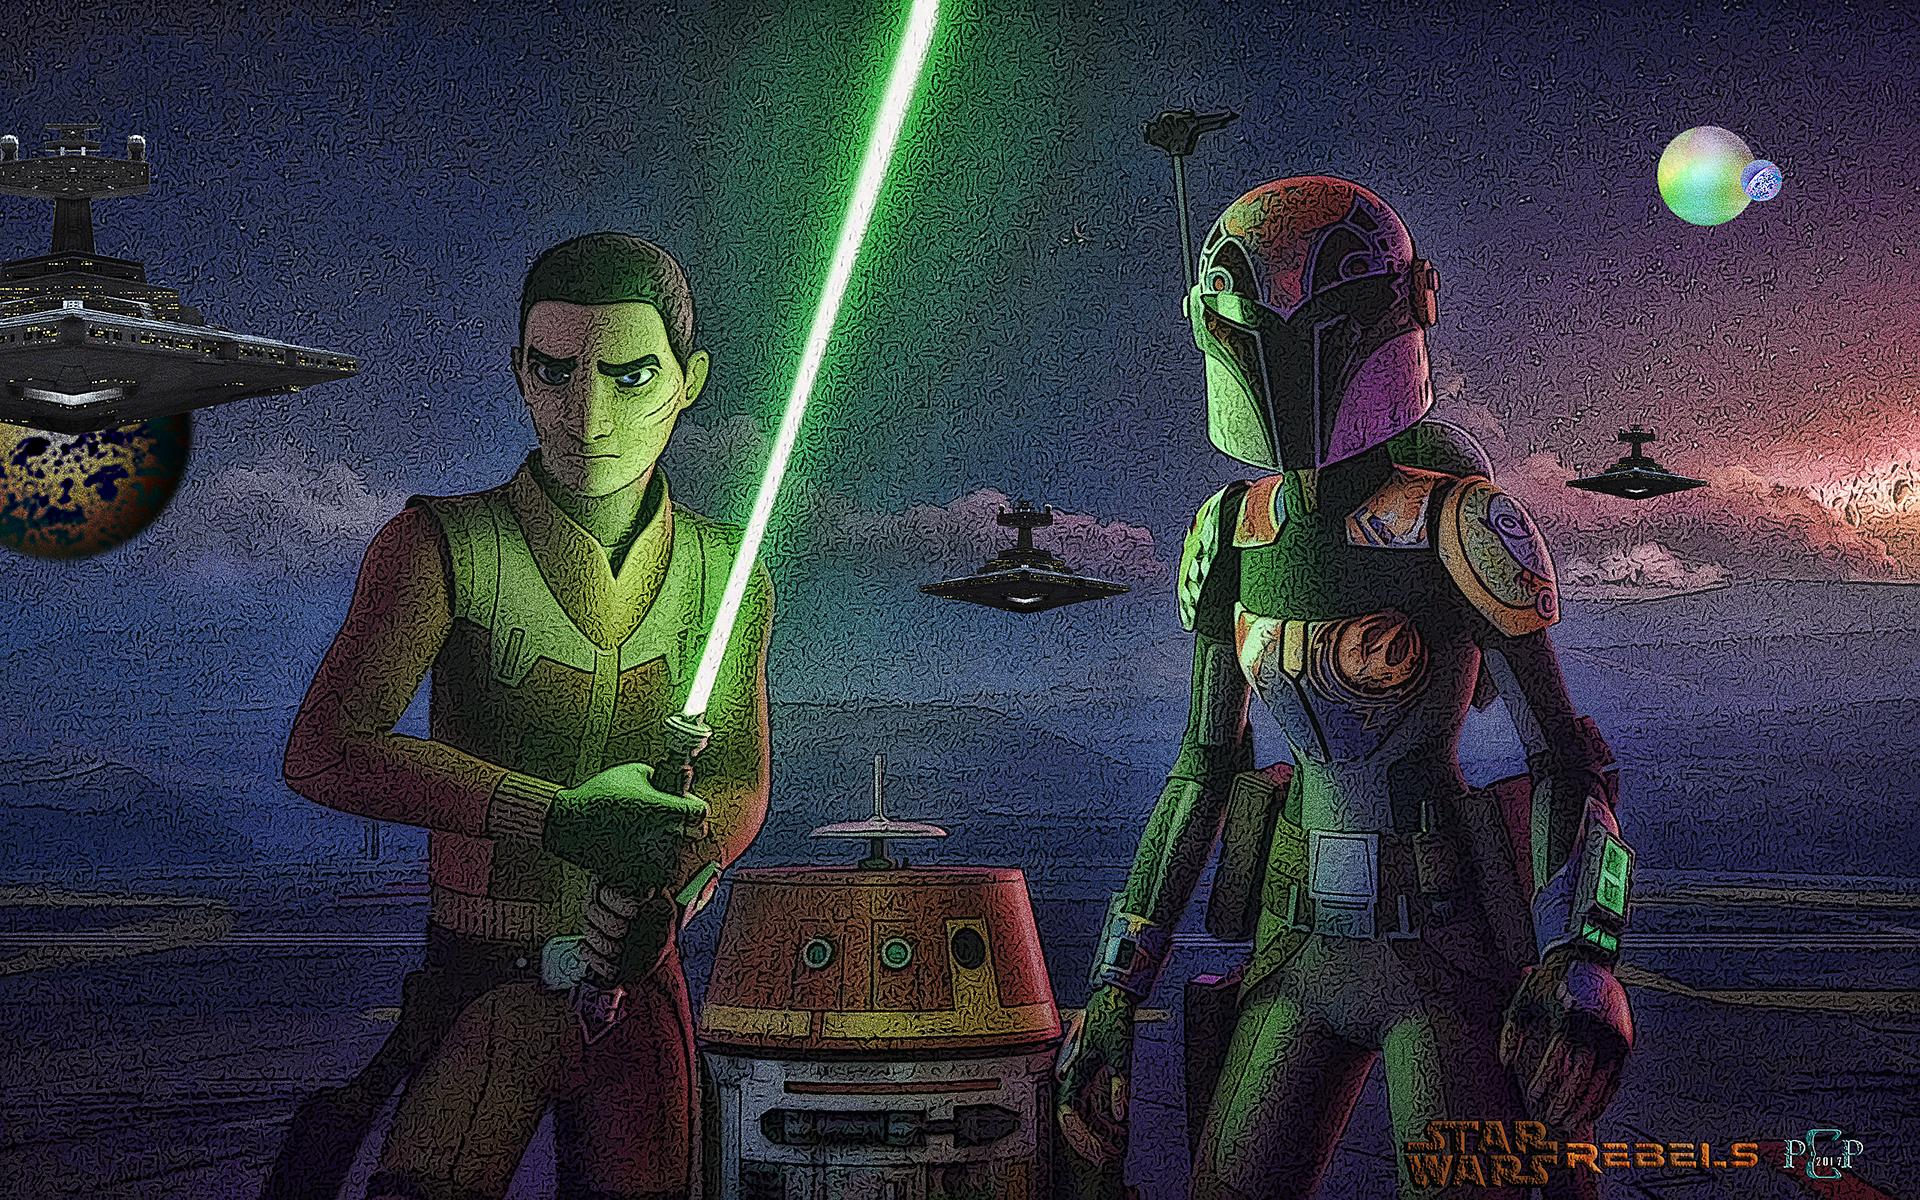 Fanart Star Wars Rebels Ezra Chopper And Sabine By Csuk 1t On Deviantart